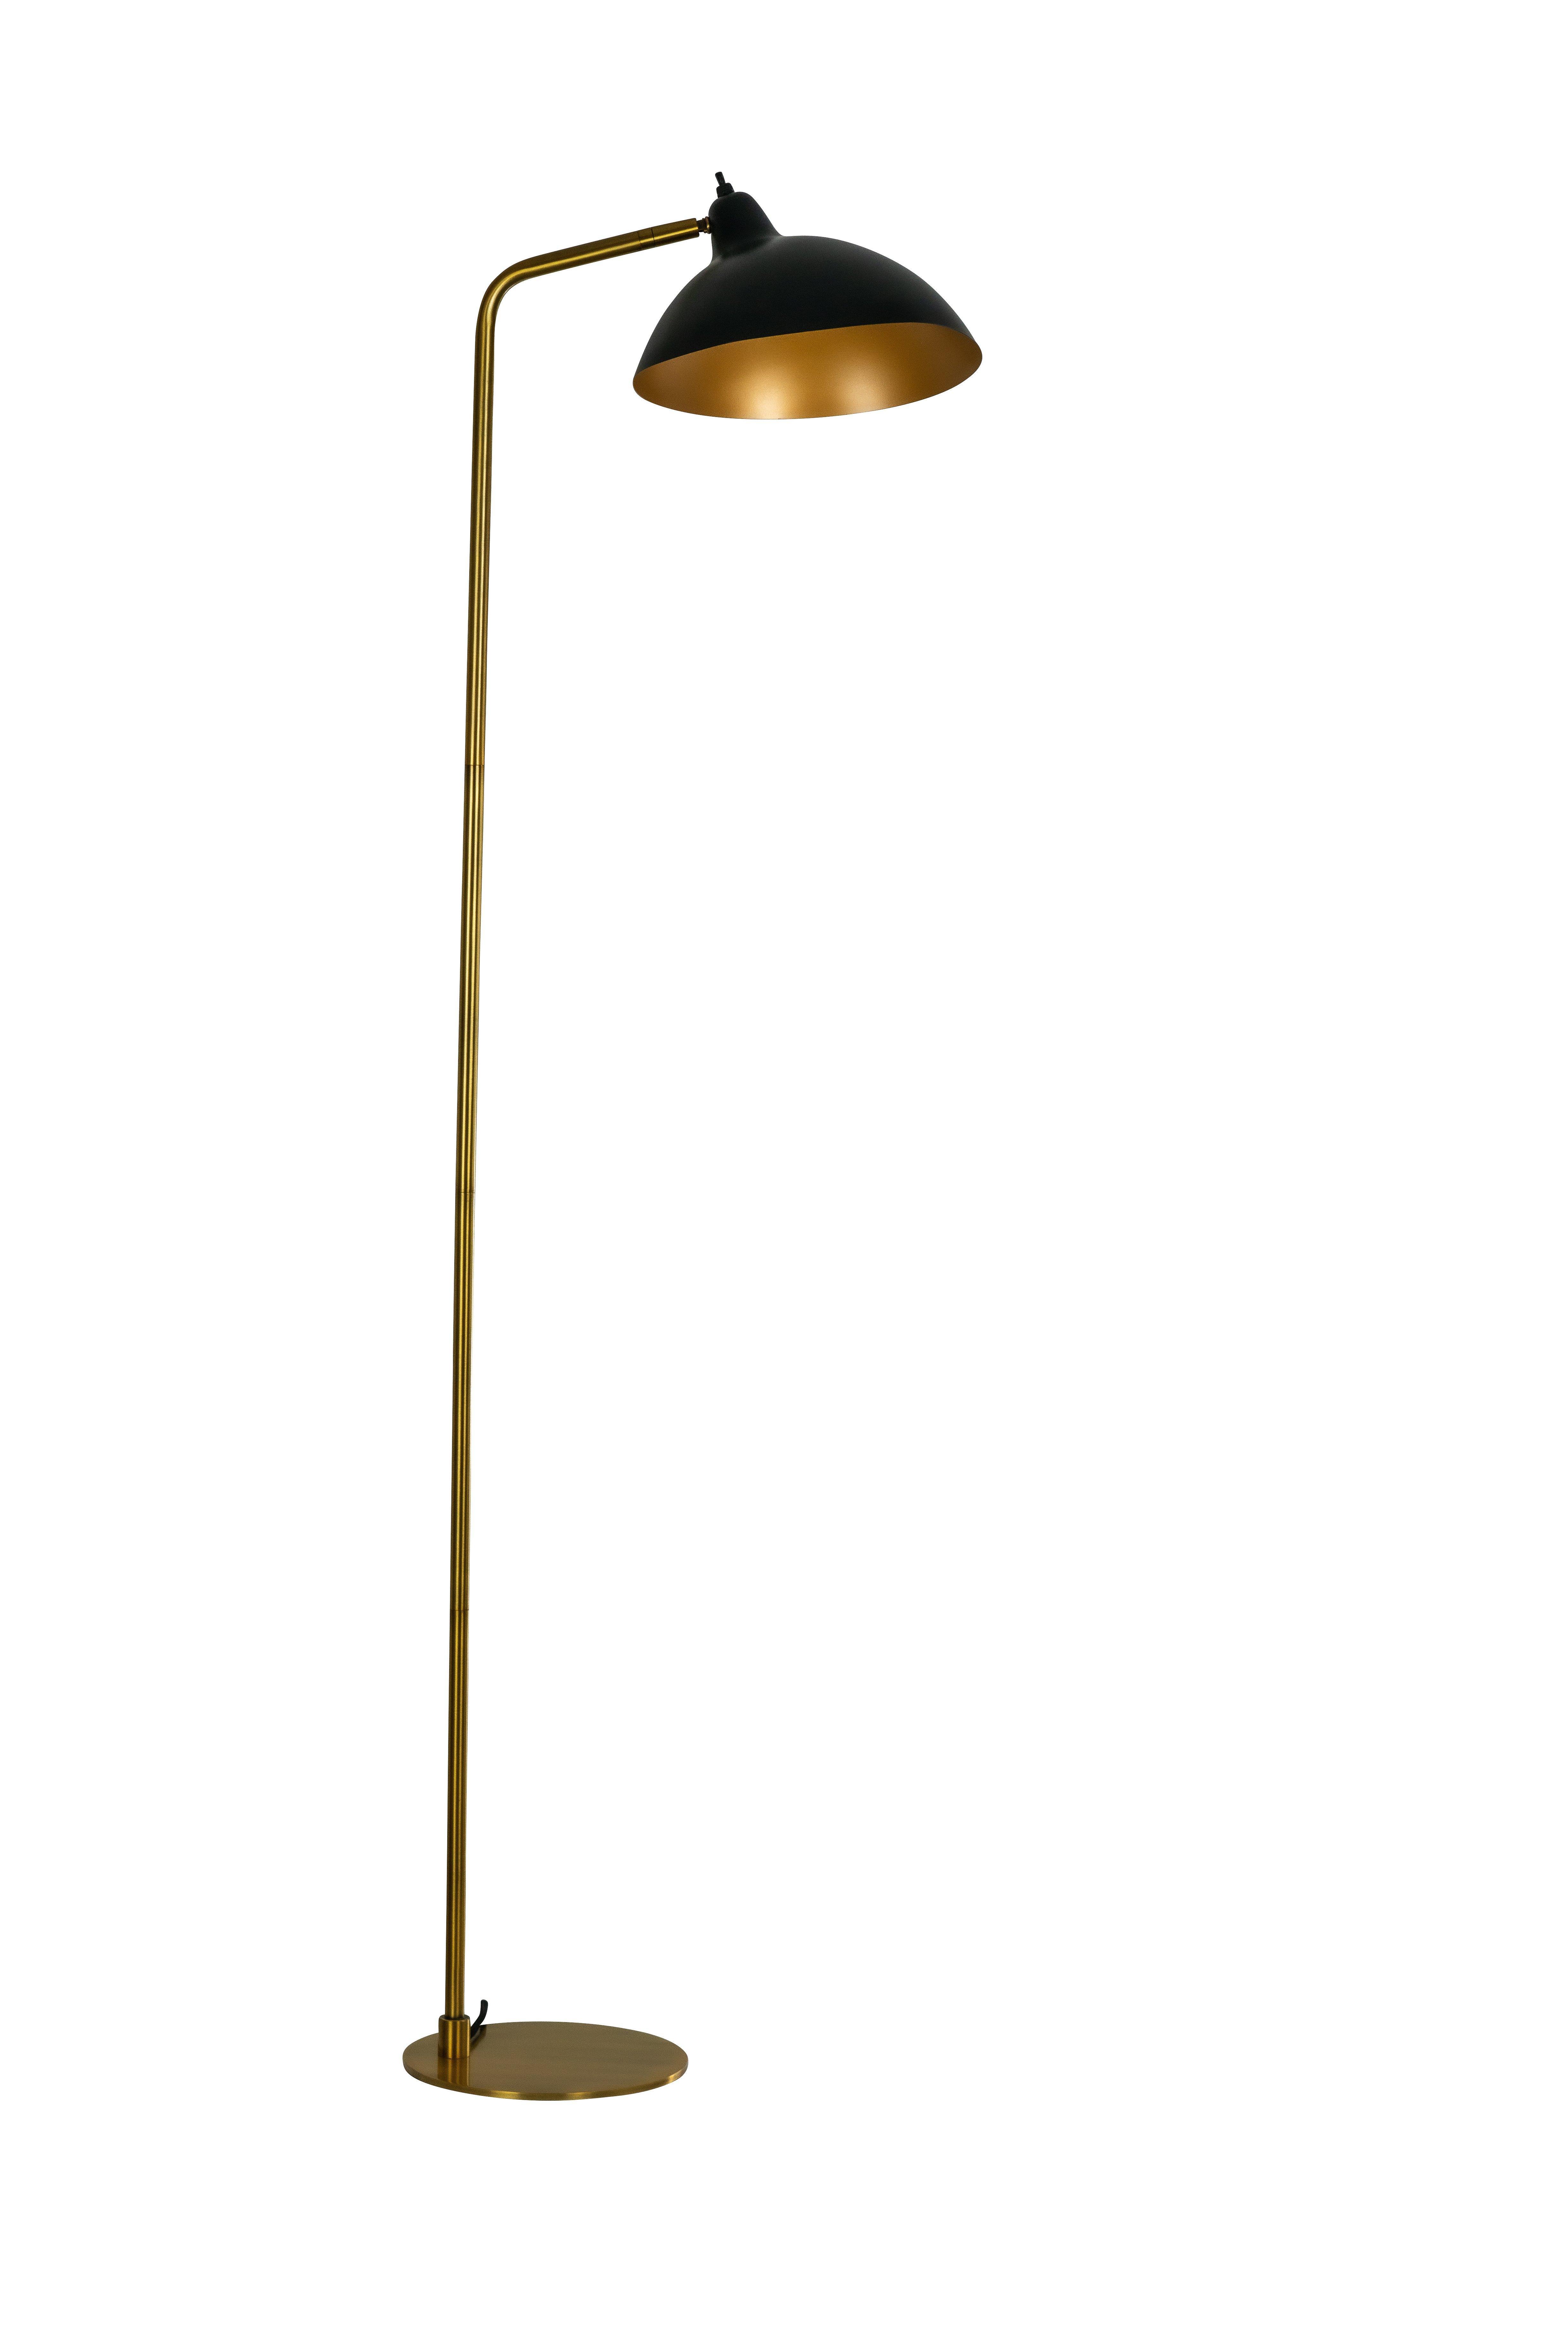 Dyberg-Larsen - Futura Floor Lamp - Black/Brass (7221)